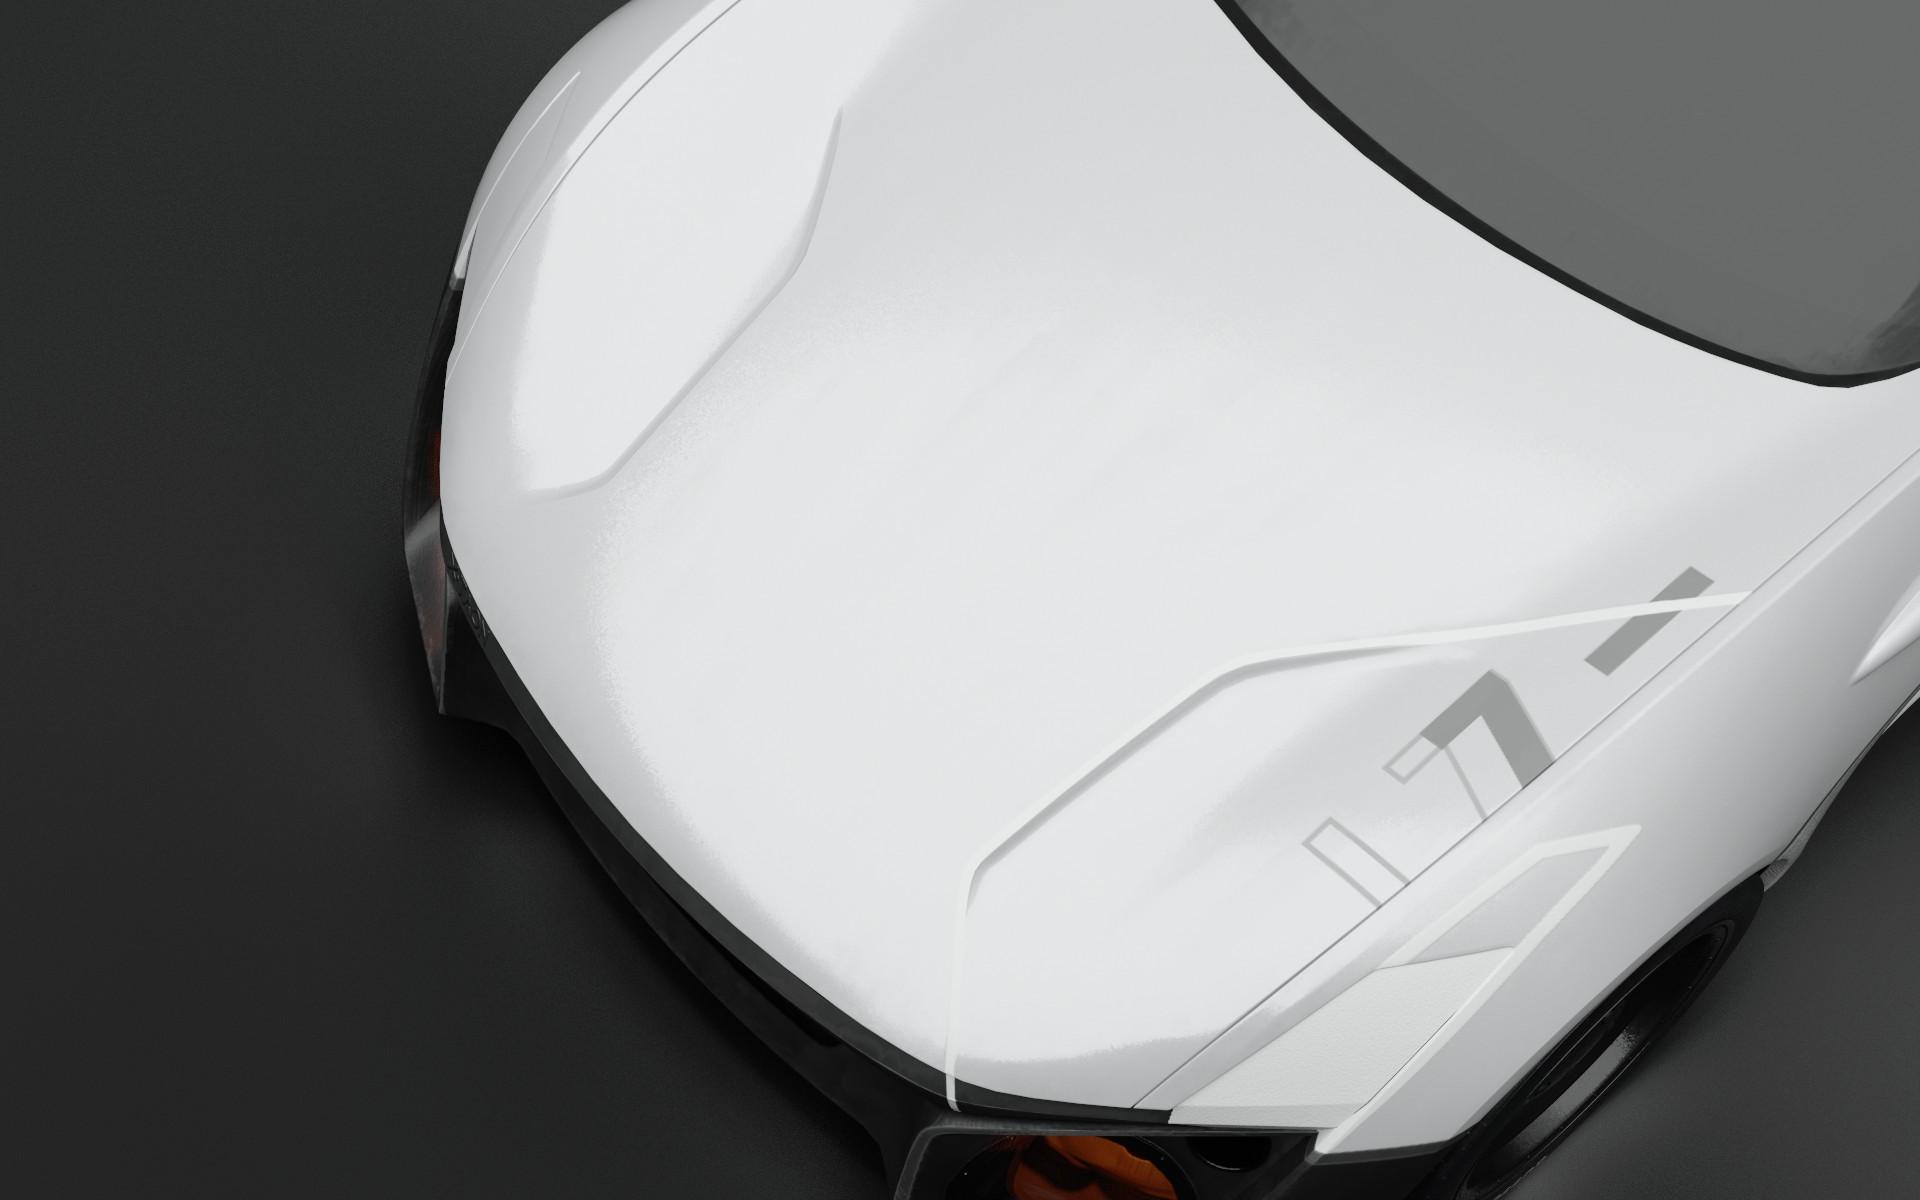 thomas charier xtaon 3D texturing contest substance painter concept car hood